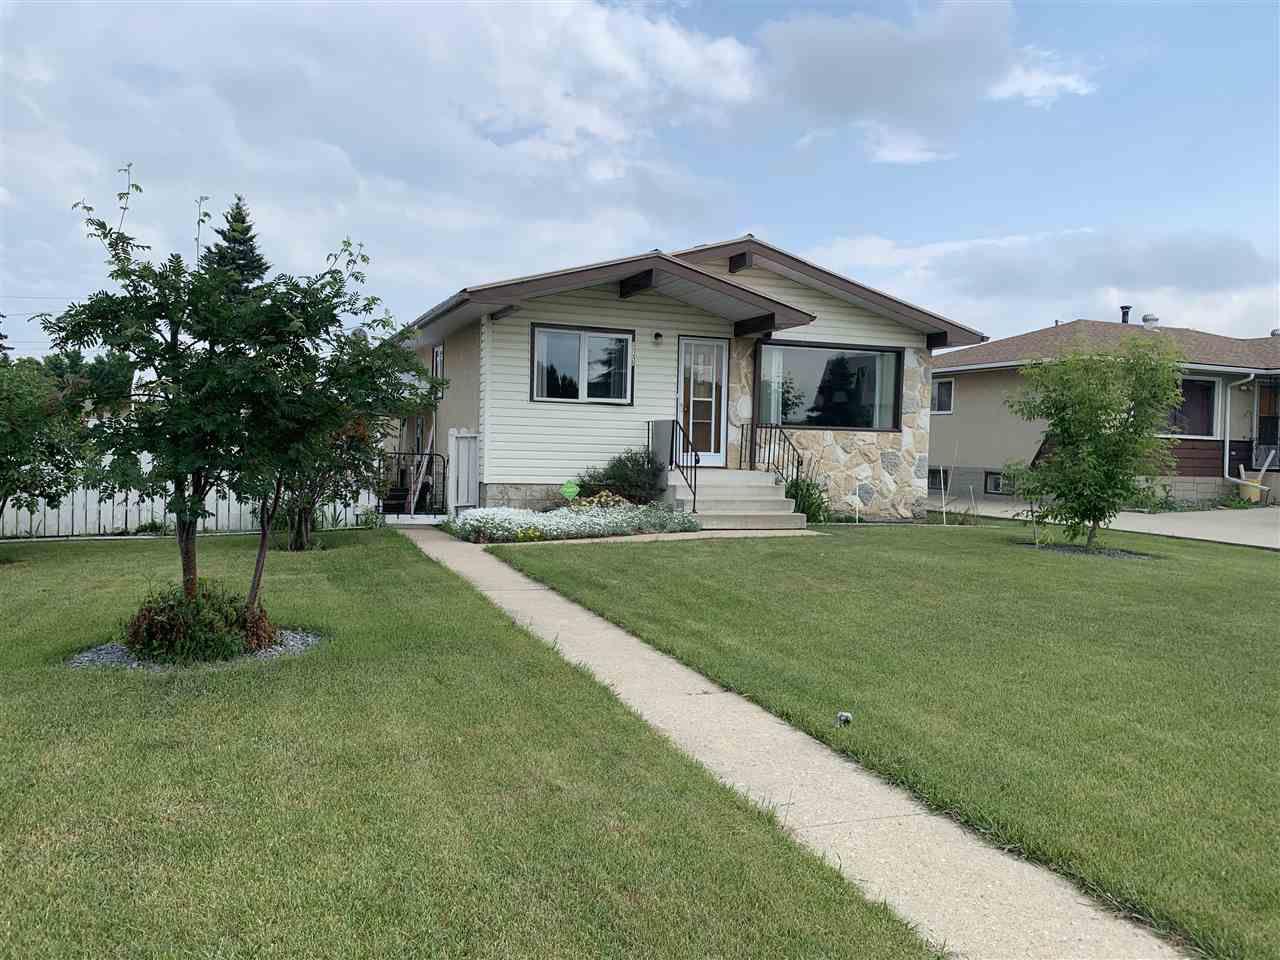 Main Photo: 9708 99 Street: Westlock House for sale : MLS®# E4162735